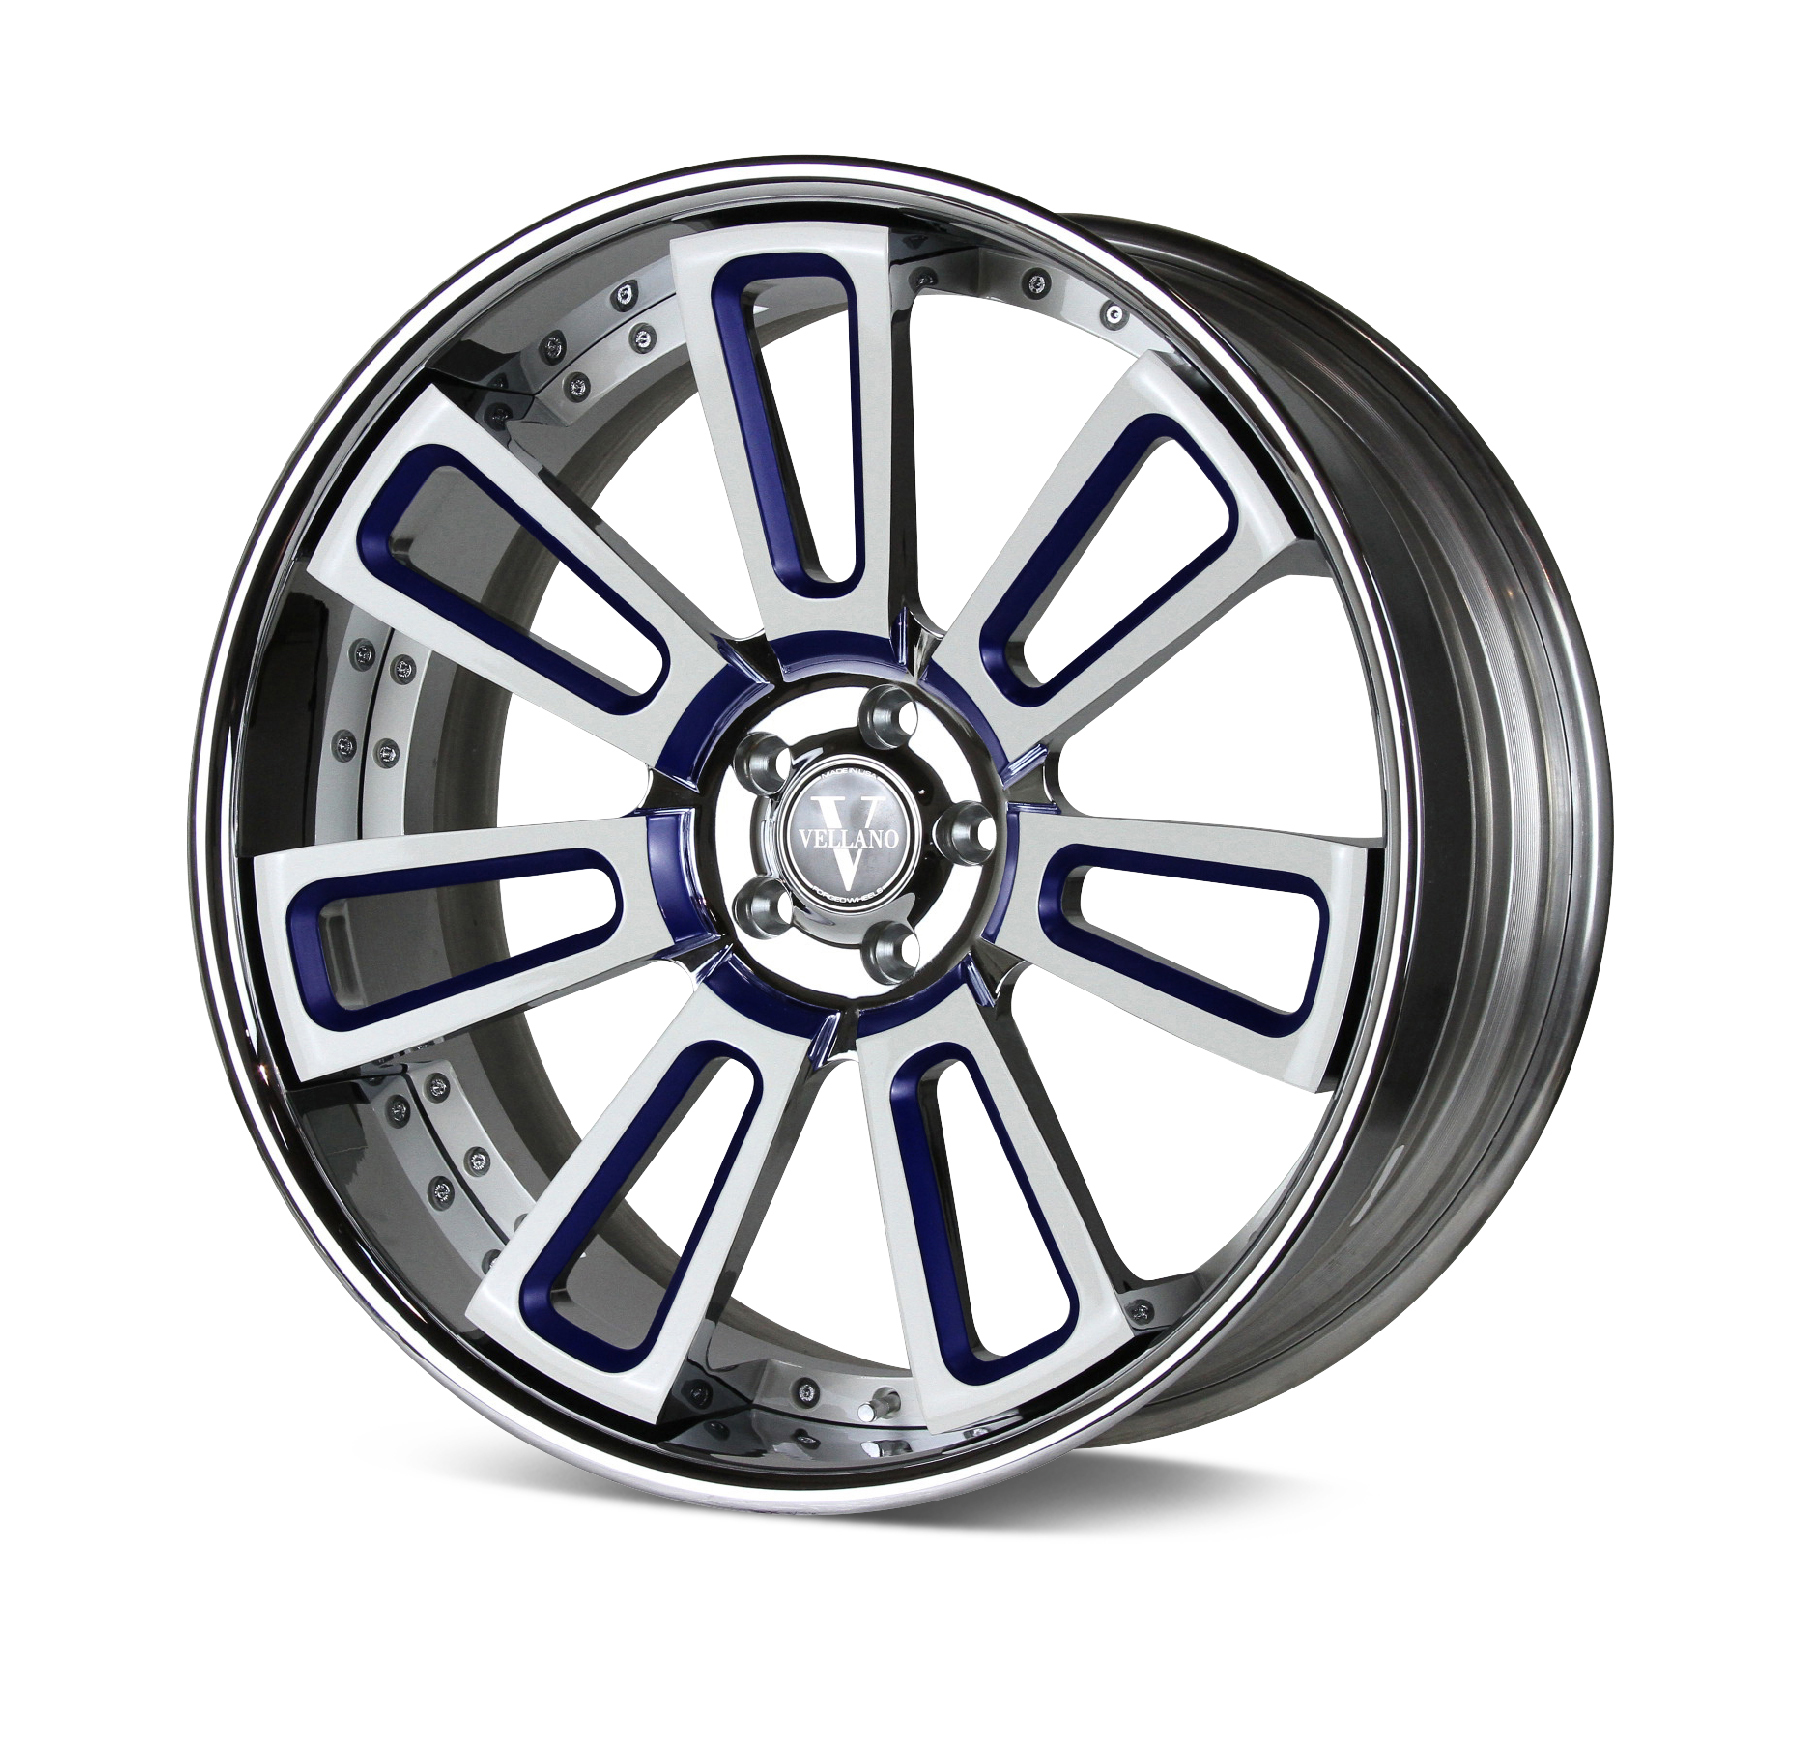 Vellano VKG forged wheels